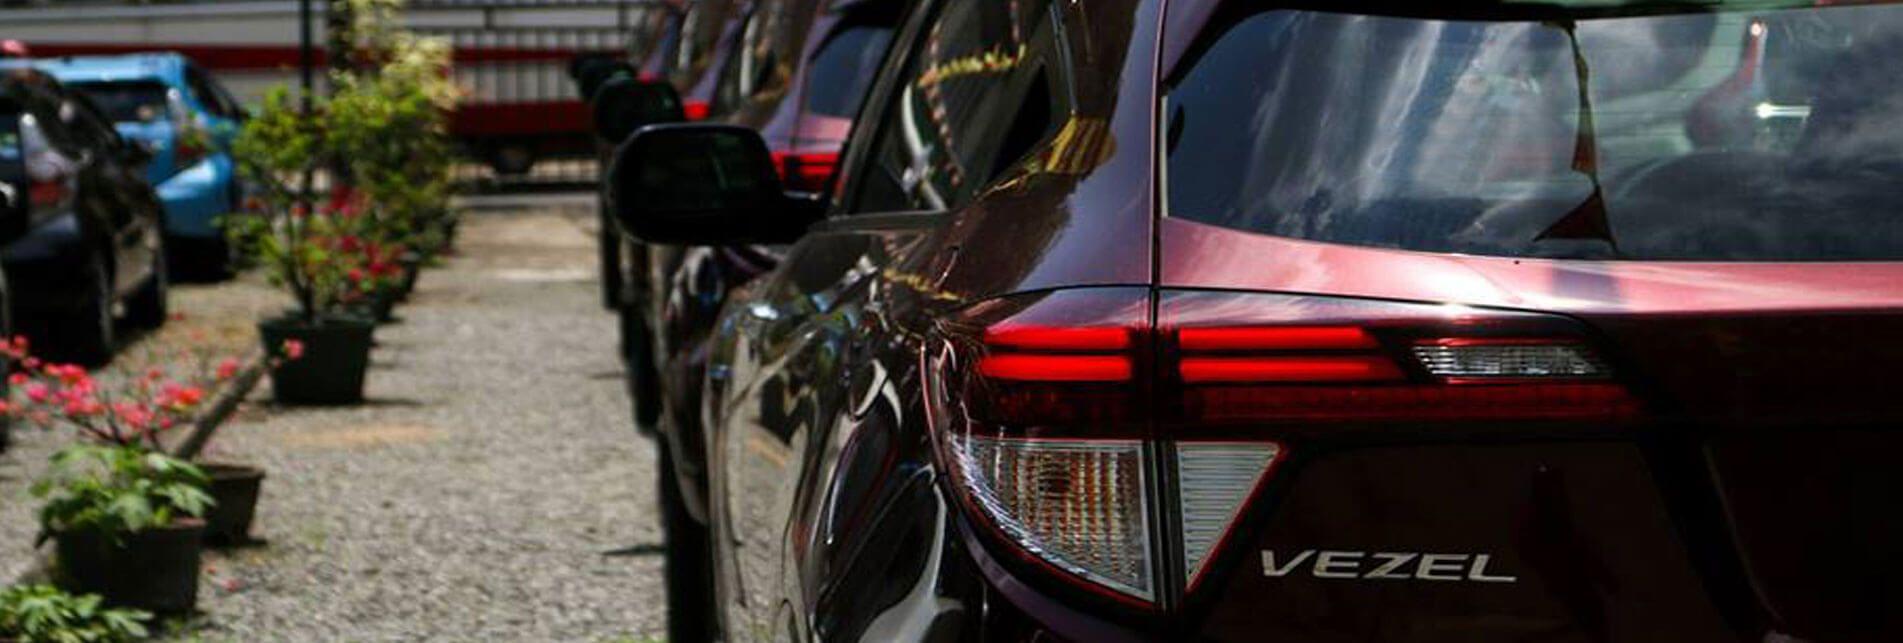 car sale sri lanka Car, Motor car, Sale